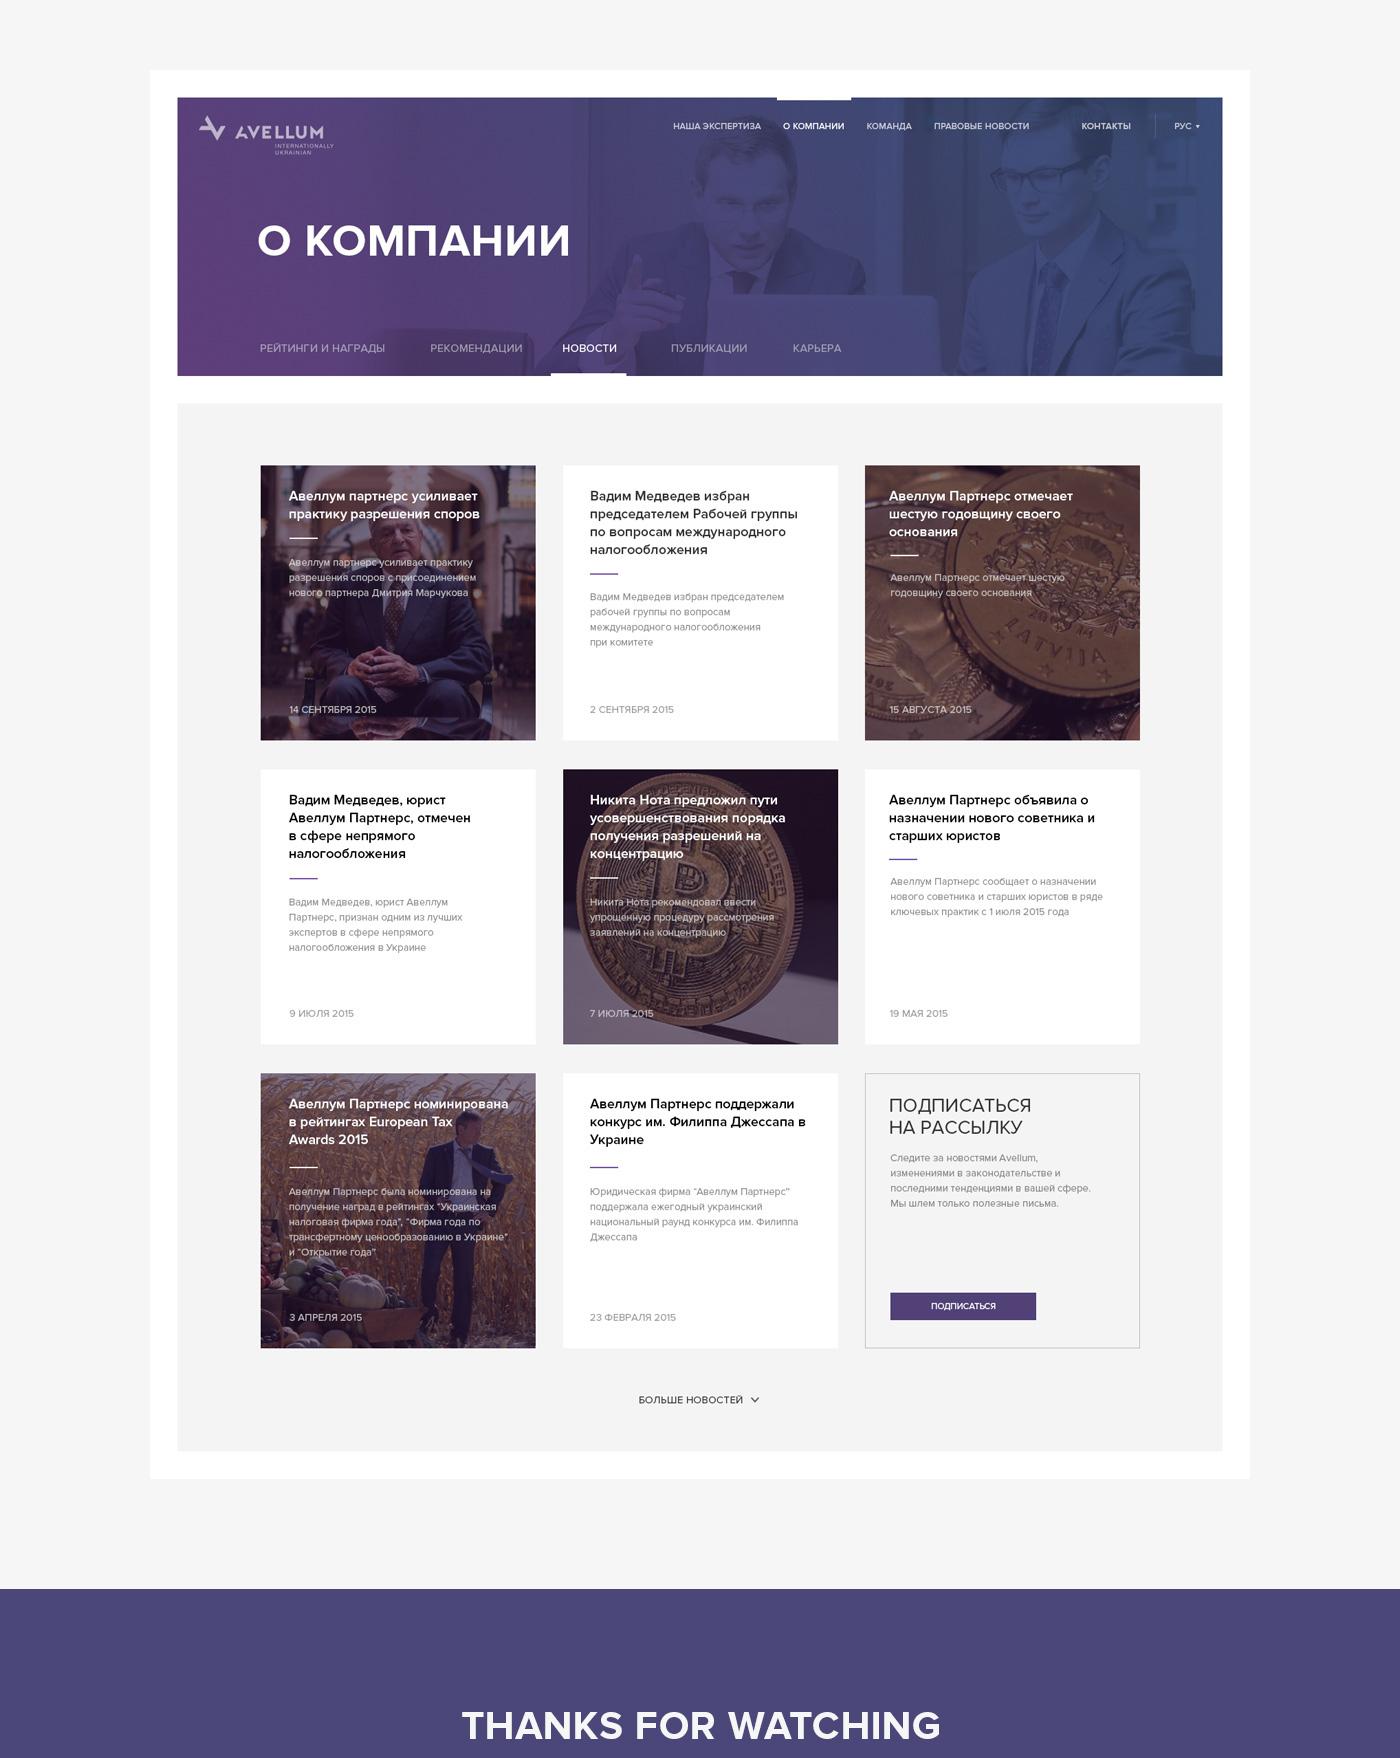 aimbulance Avellum law expertise finance legal Webdesign Responsive mobile transaction ukraine Website